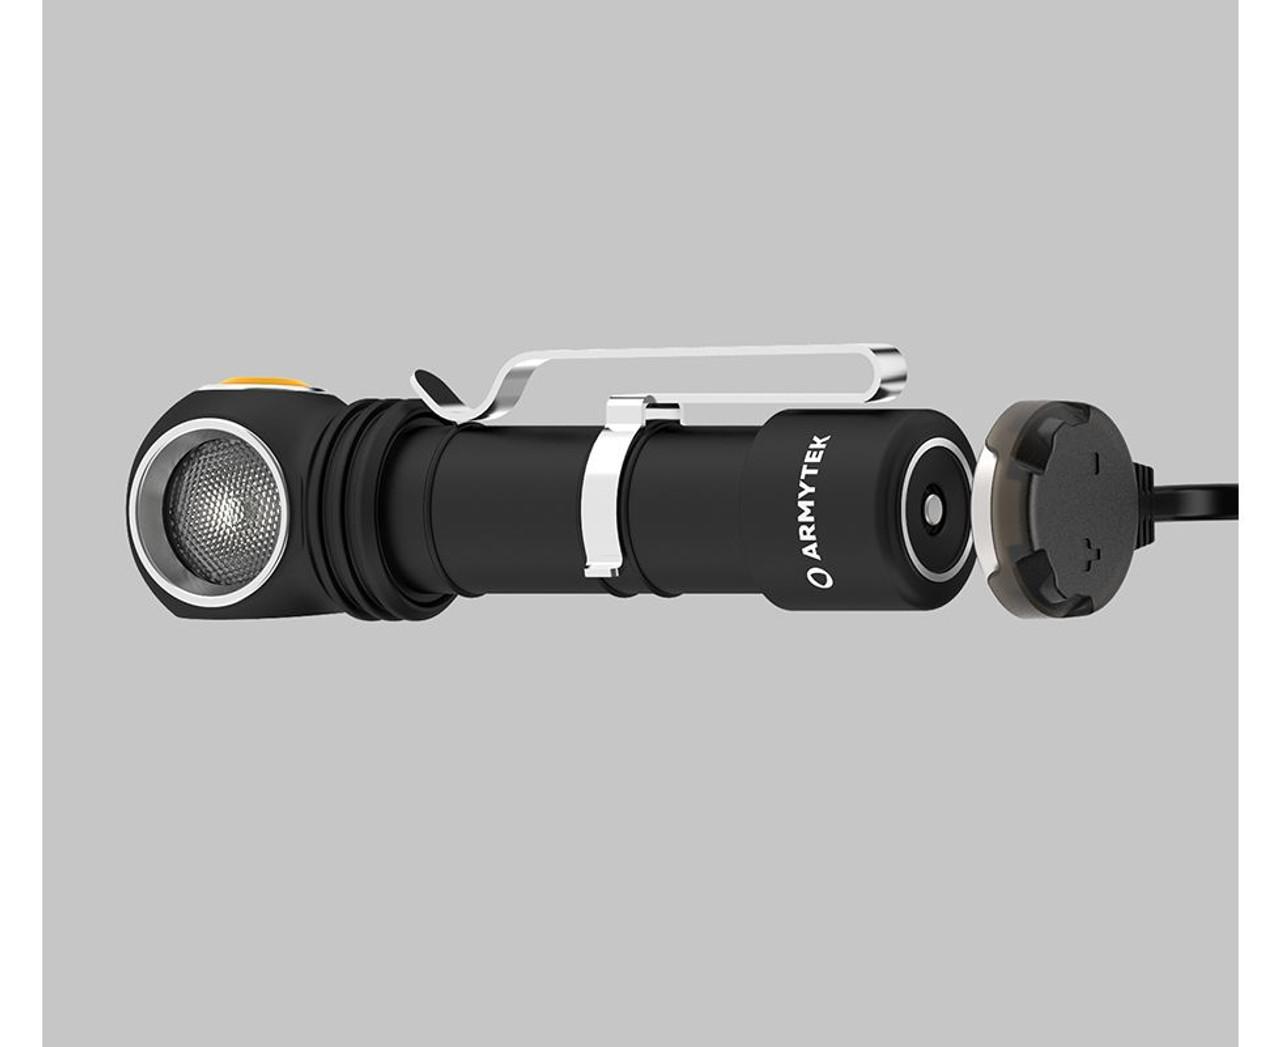 Armytek Wizard C2 Pro Max Multi Flashlight 4000 Lumen USB Rechargeable